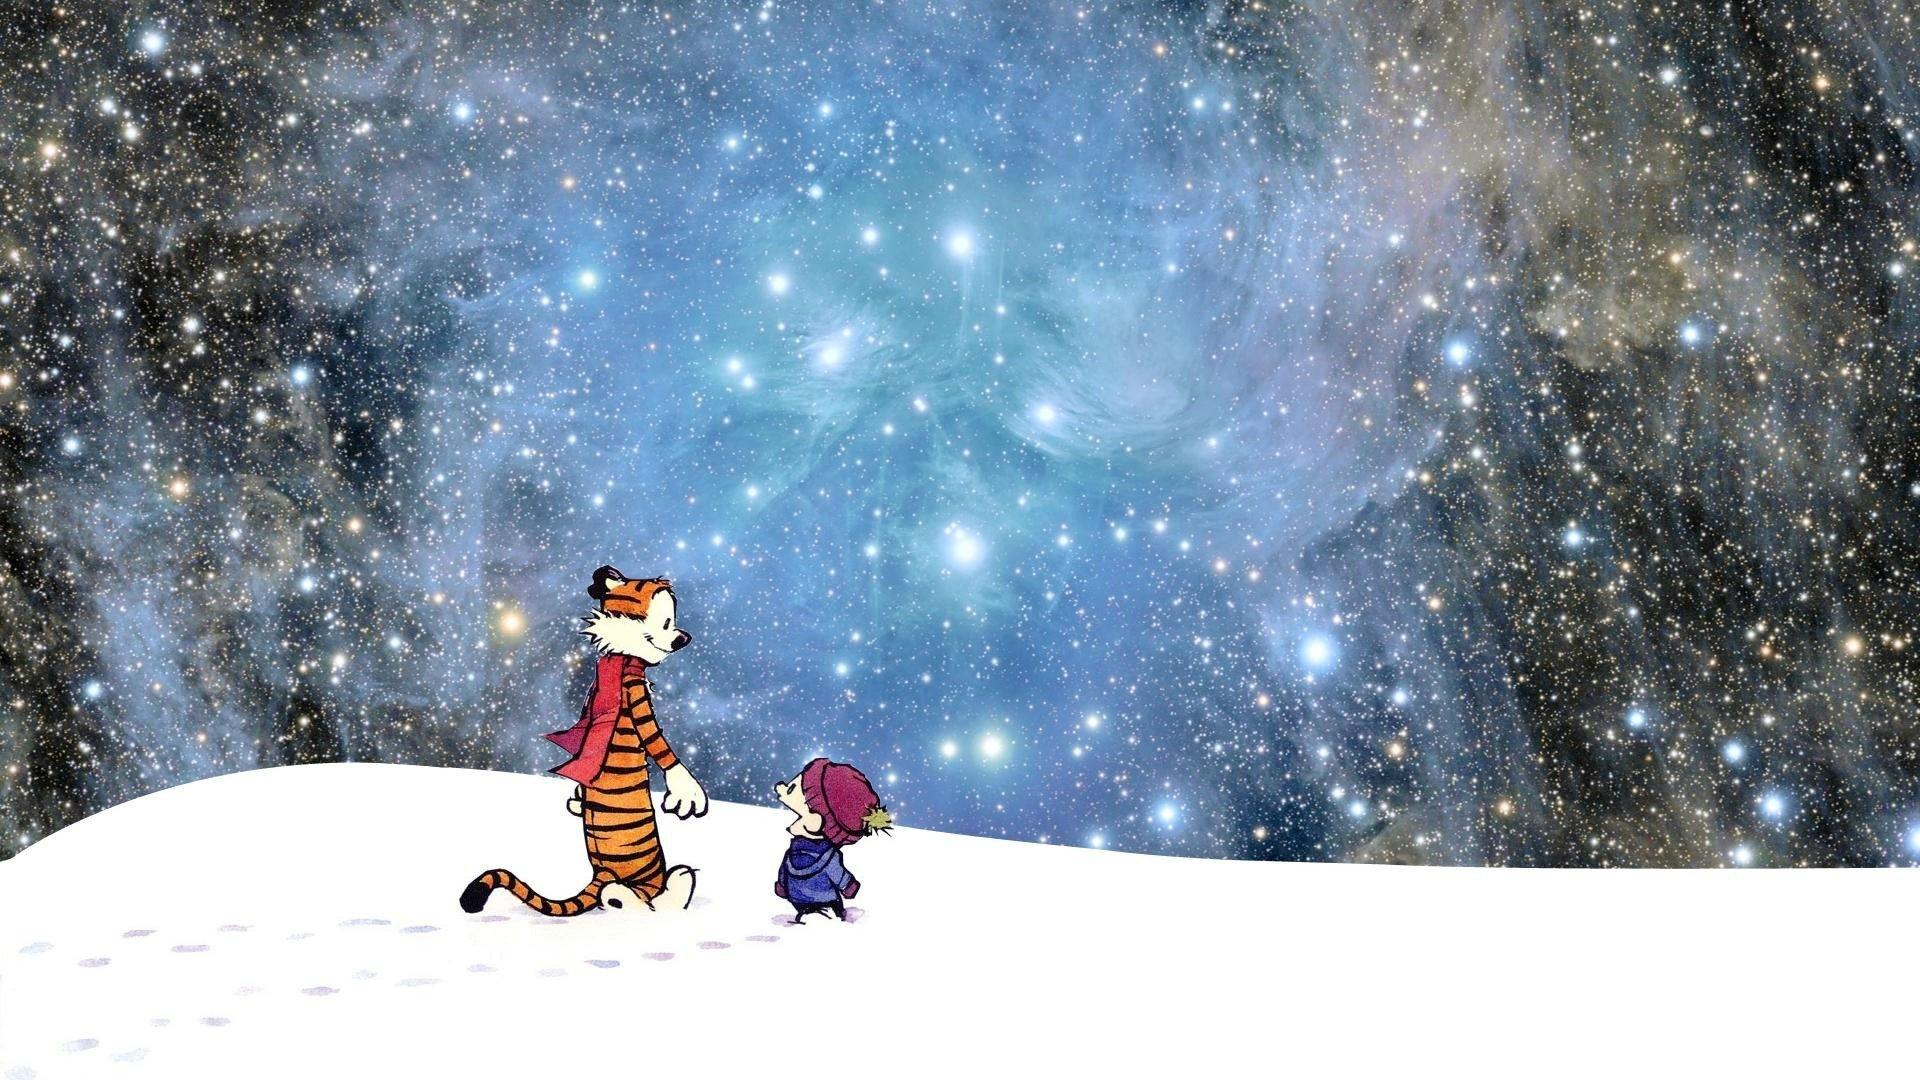 Nebula Calvin And Hobbes Hd Wallpapers Desktop And Mobile